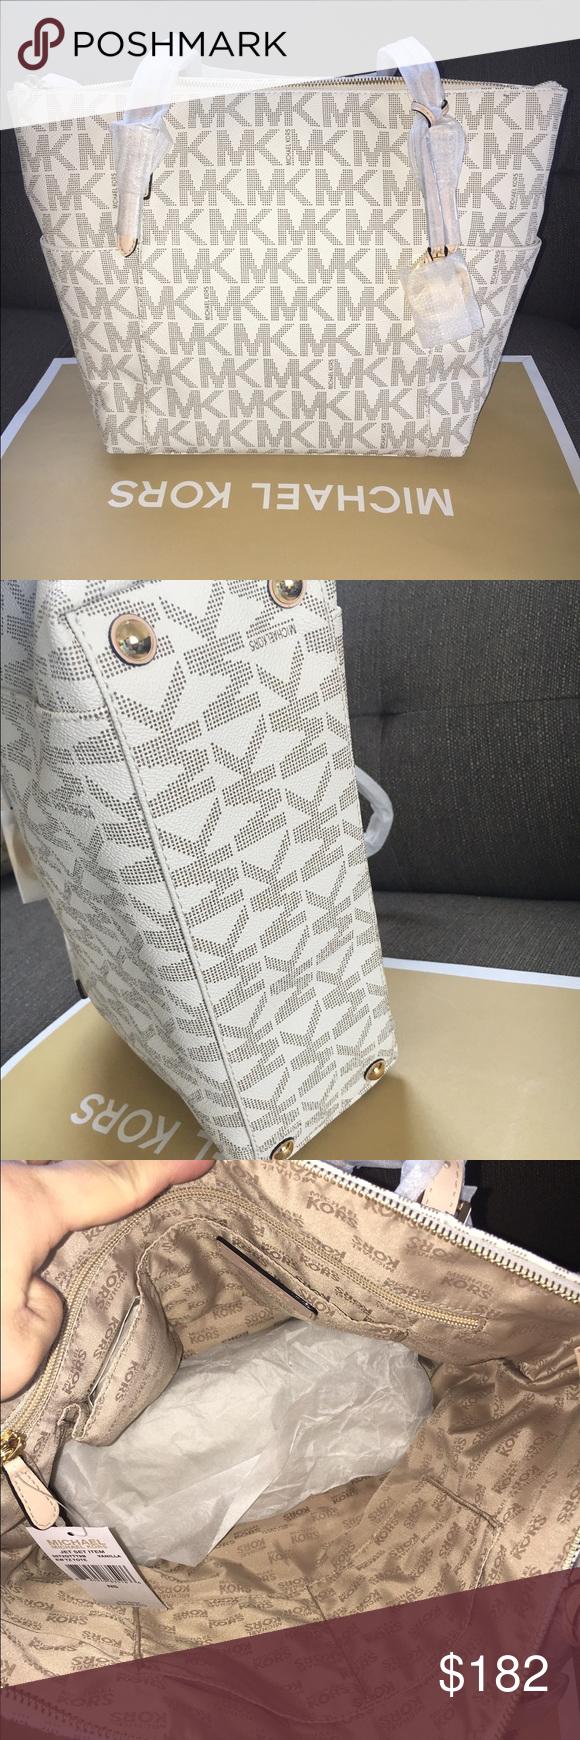 🌸MK tote vanilla signature Authenic brand new. Vanilla color. Michael Kors Bags Totes